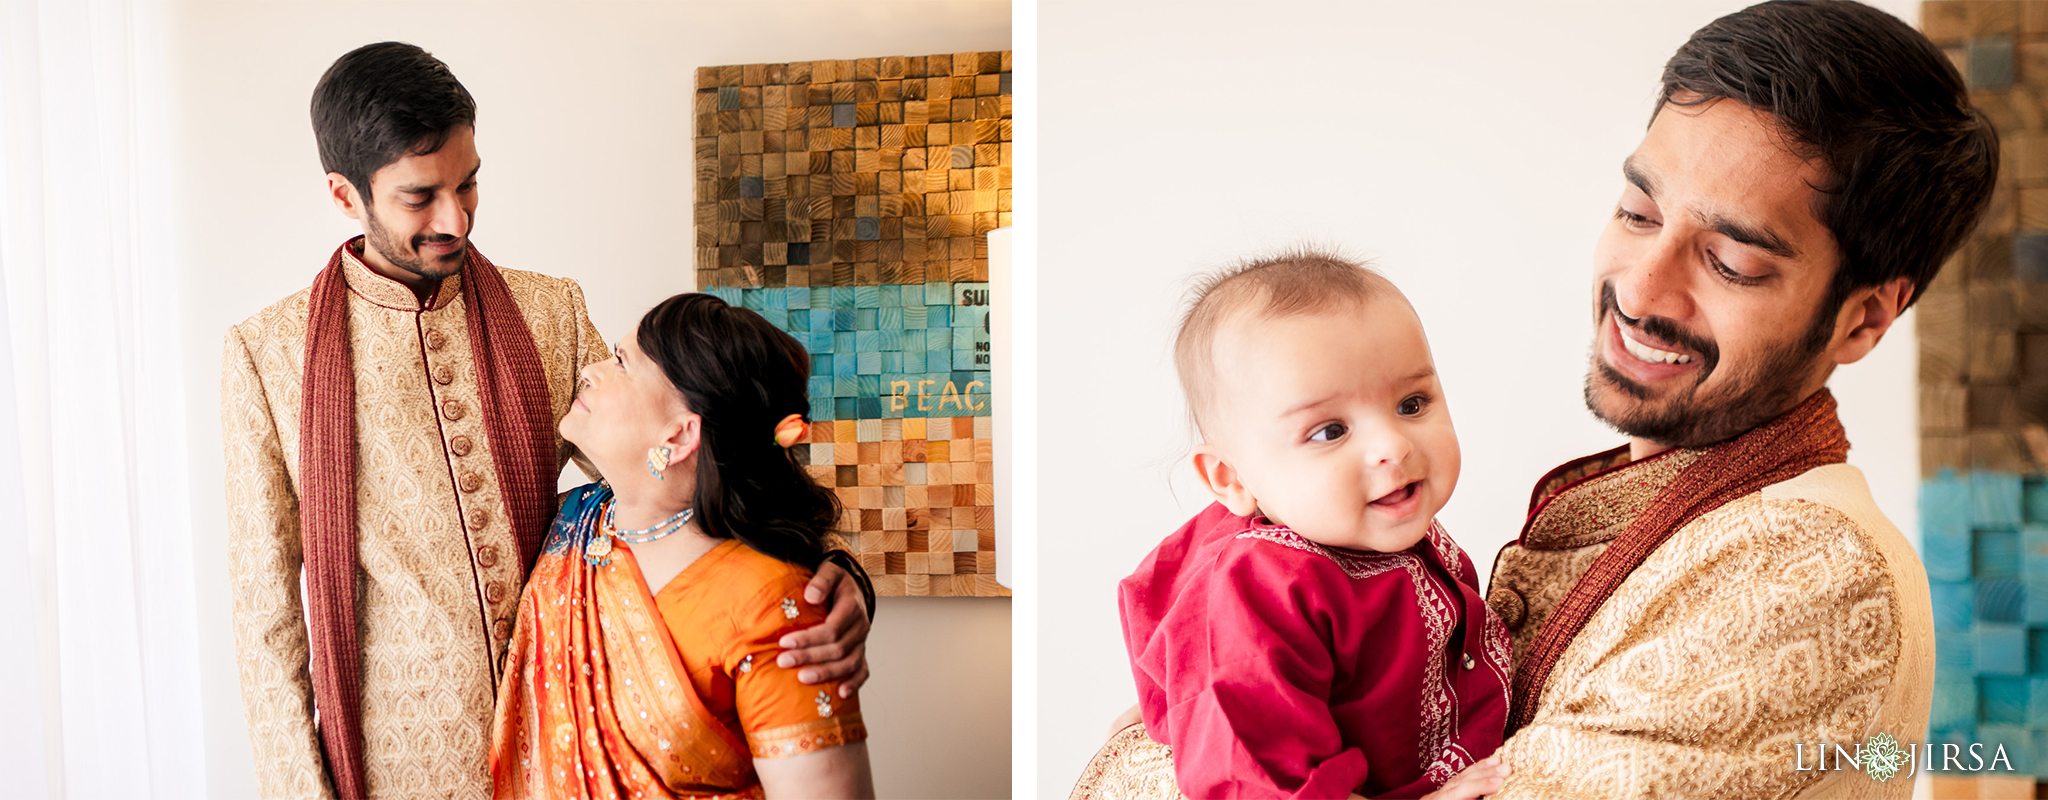 07 Hilton Mission Bay San Diego South Asian Wedding Photography